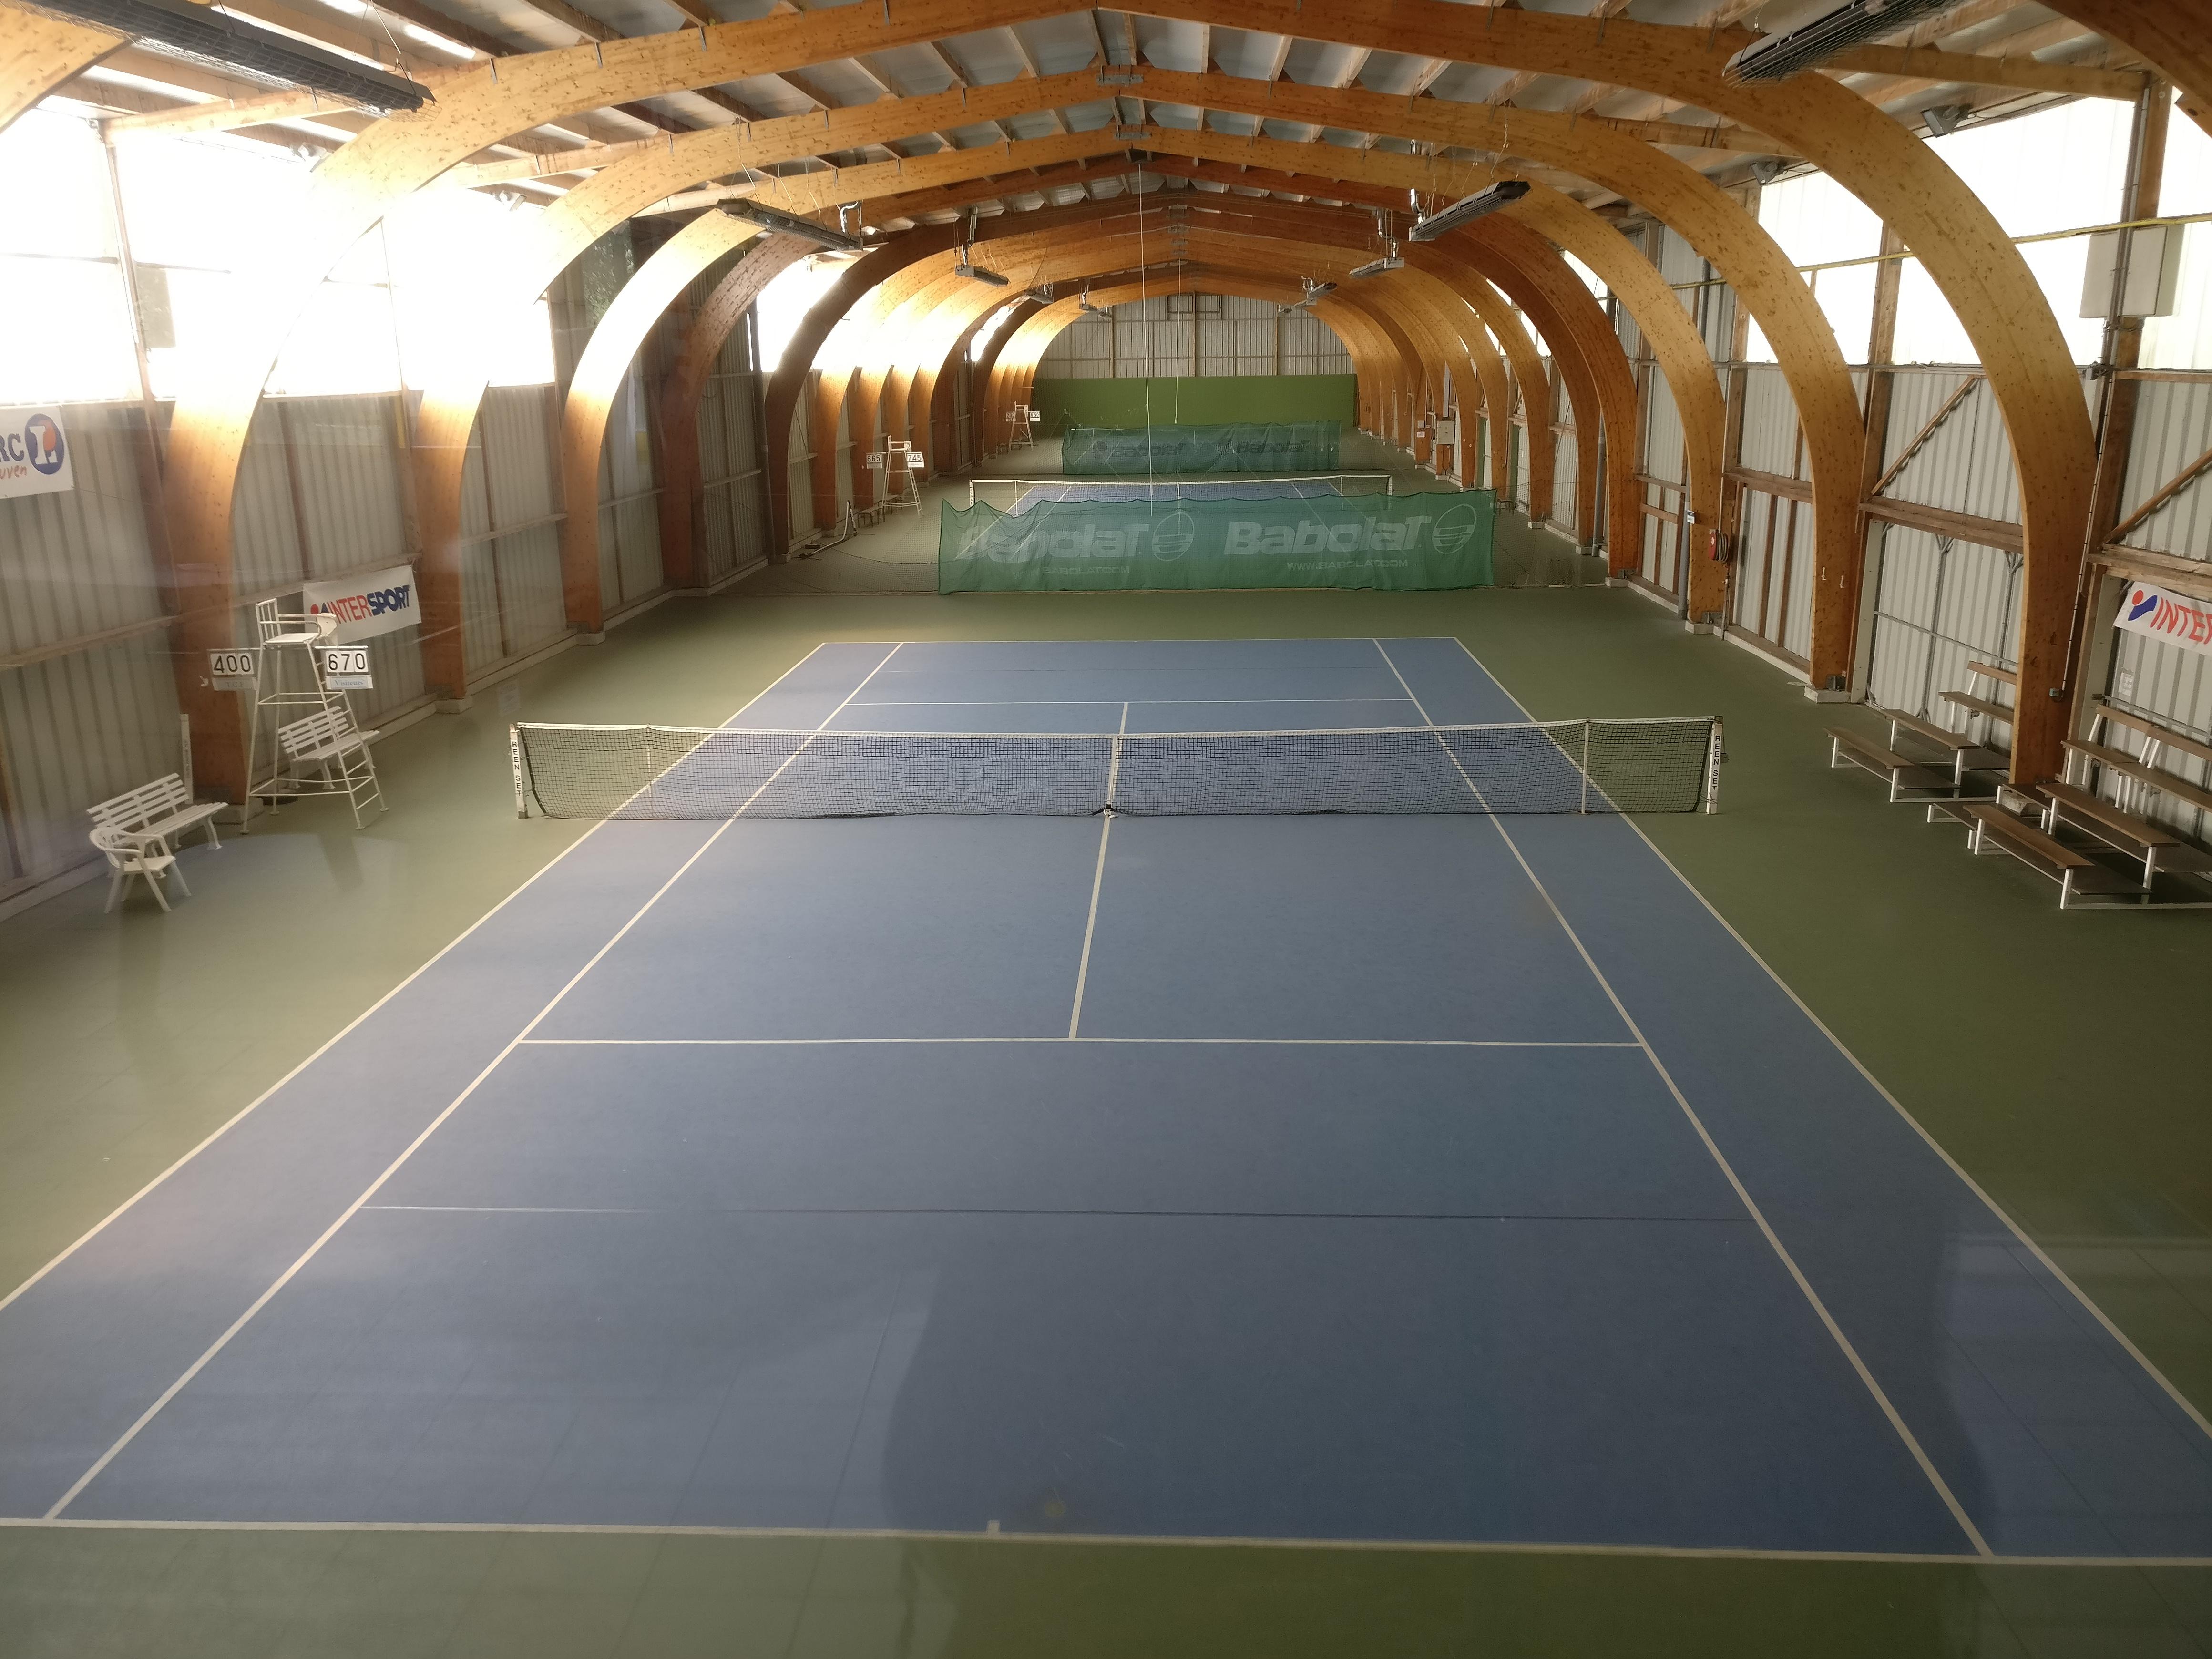 Tournoi de tennis de Fouesnant-Les Glénan